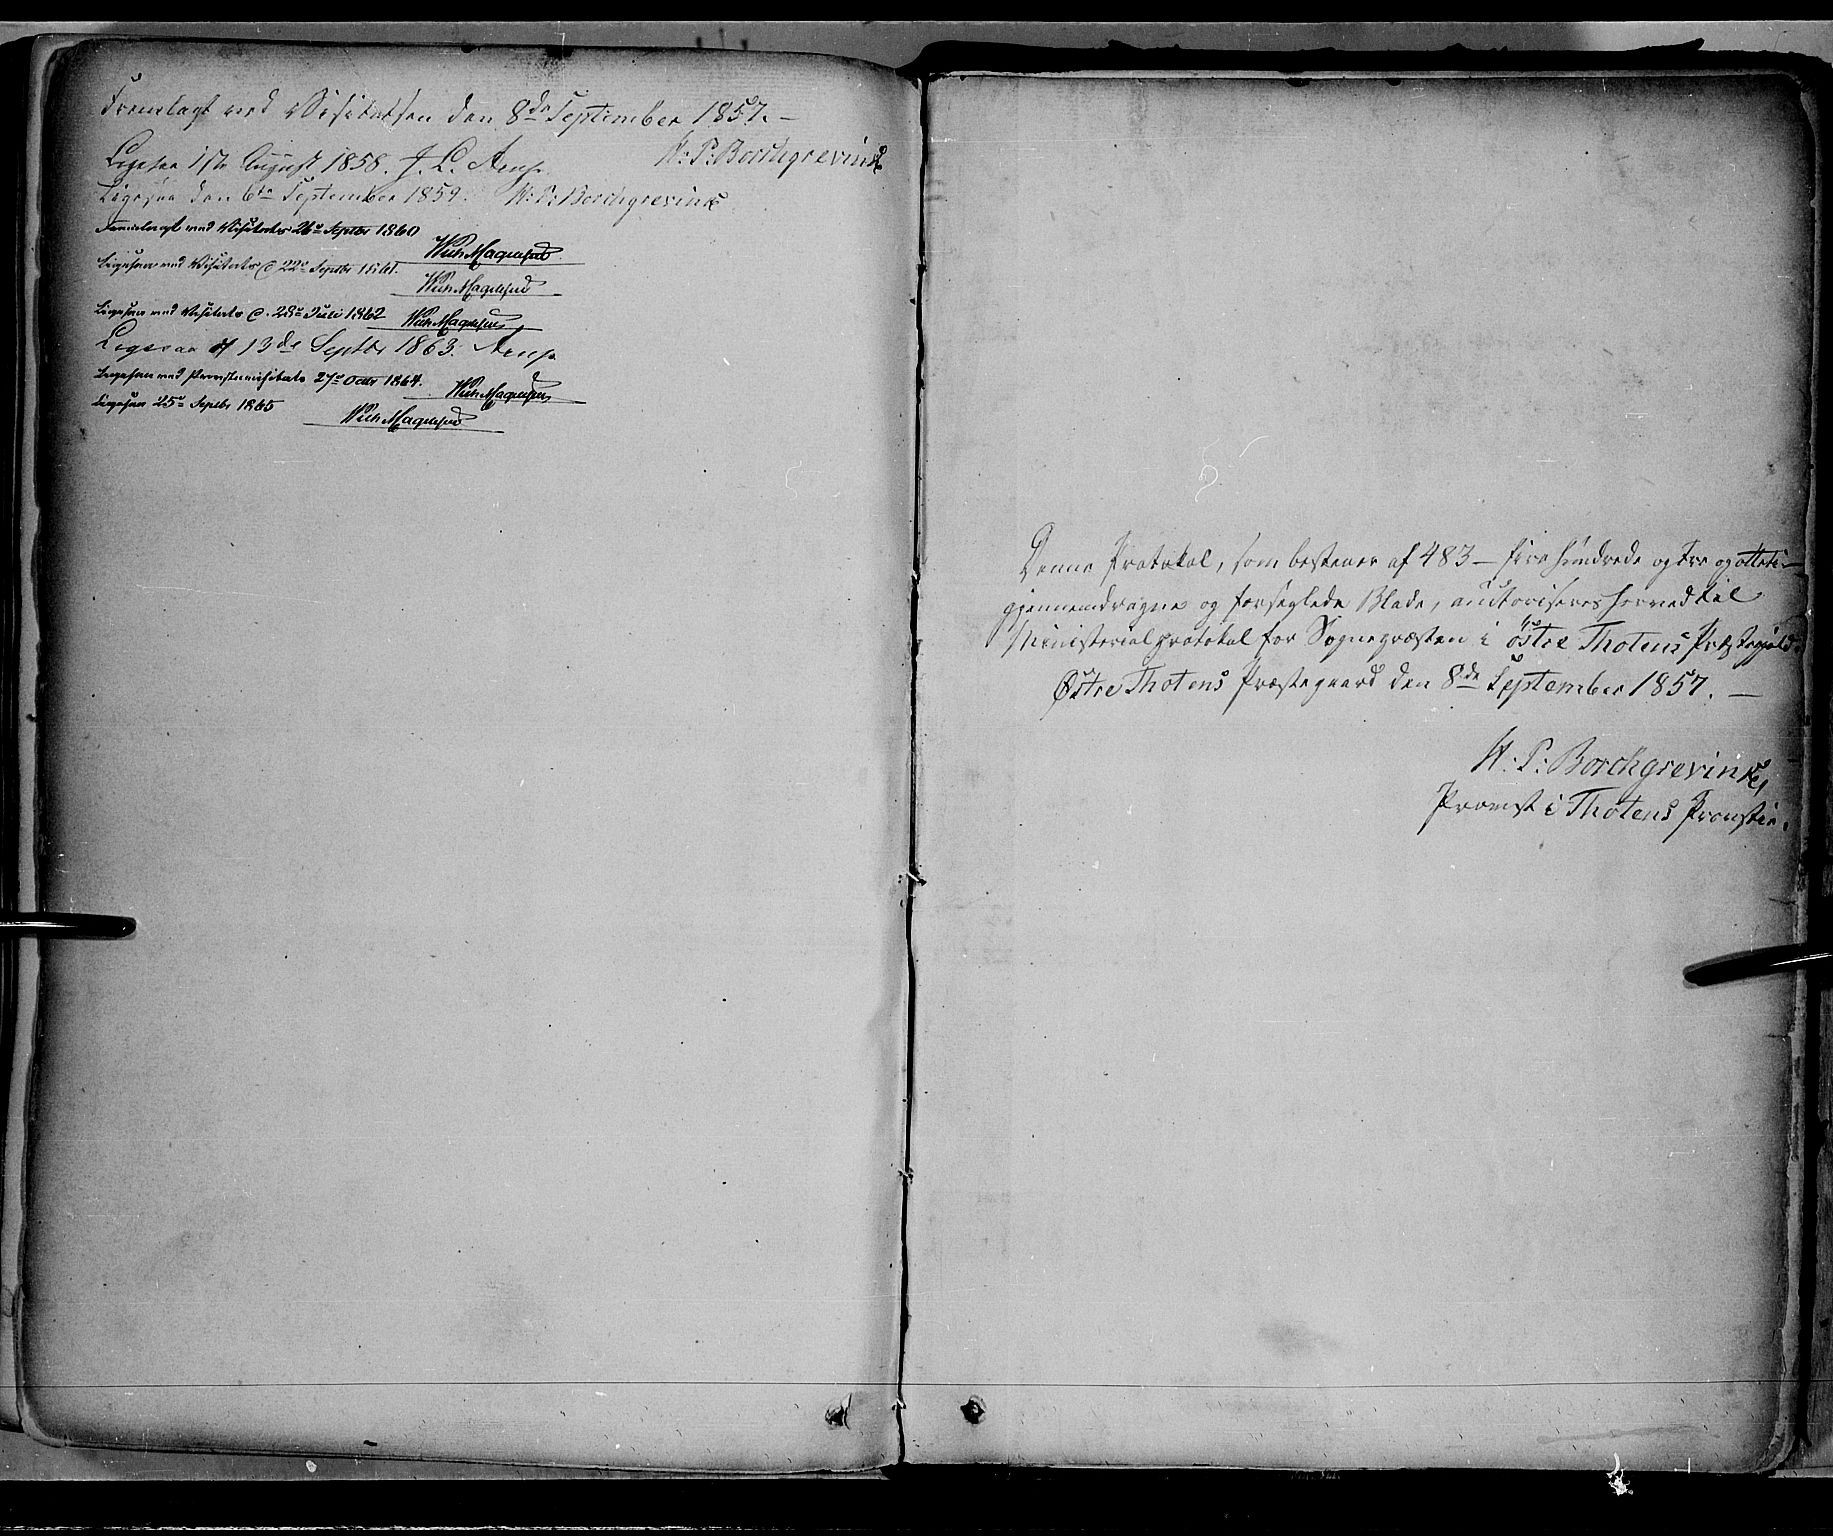 SAH, Østre Toten prestekontor, Ministerialbok nr. 4, 1857-1865